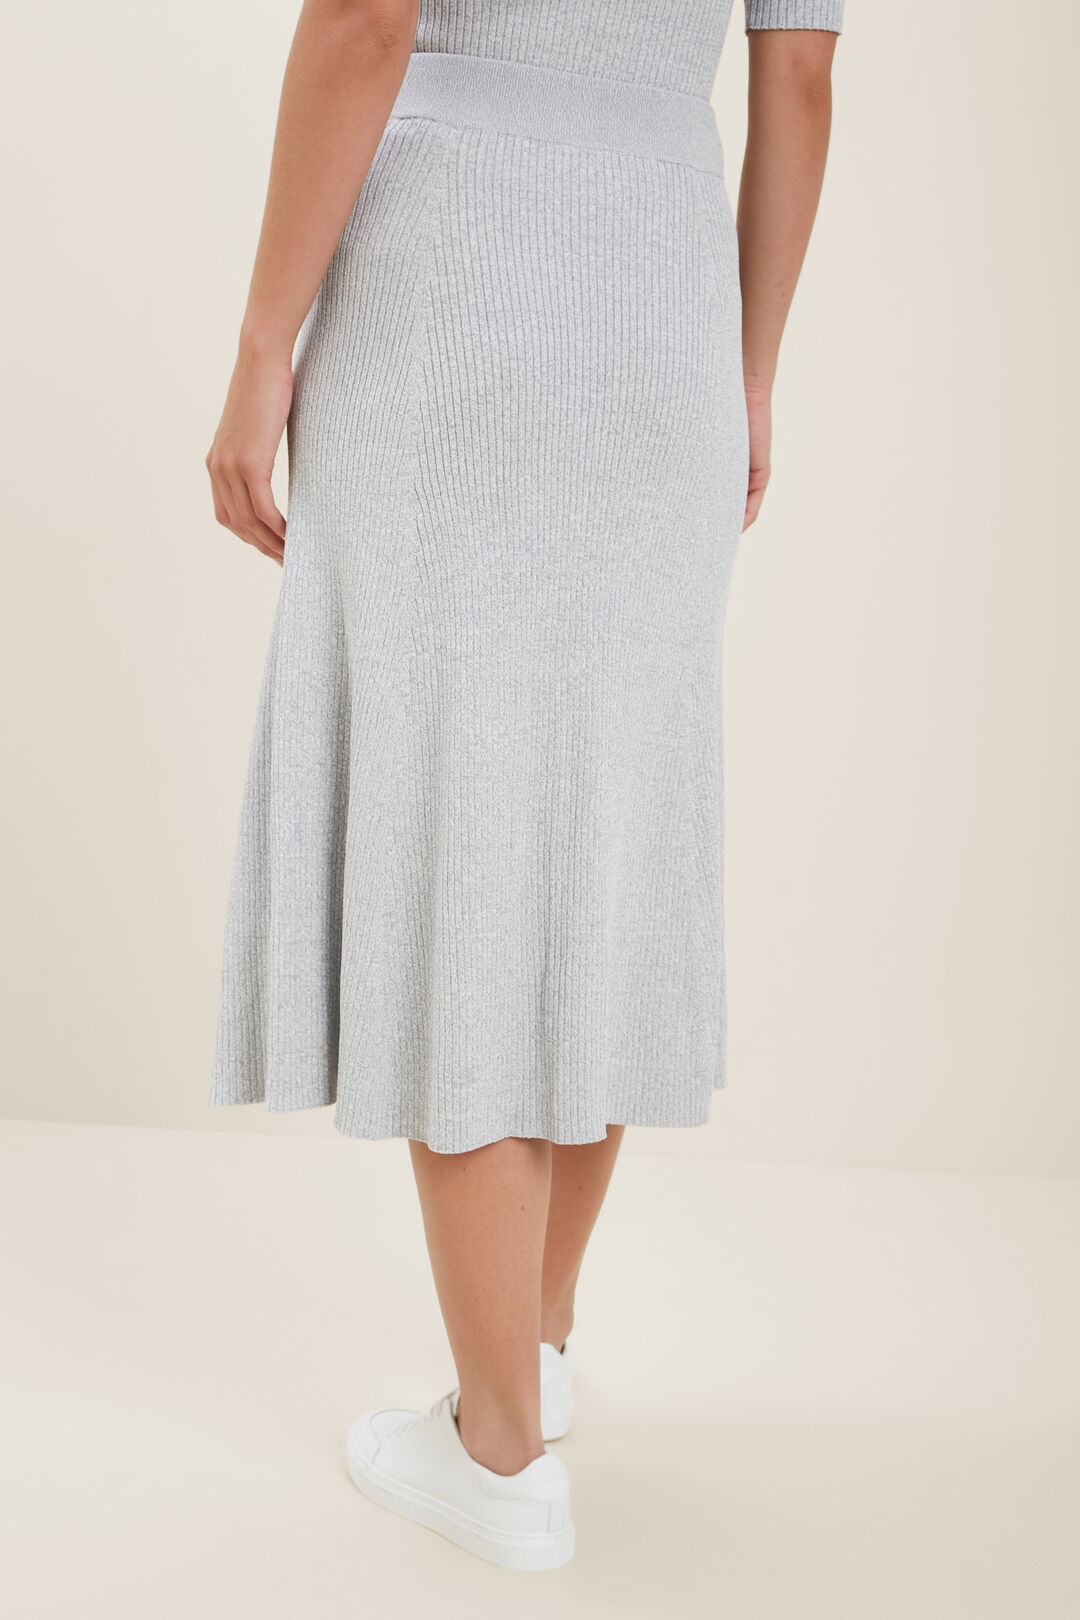 Spacedye  Rib Knit Skirt  STORMY GREY SPACEDYE  hi-res